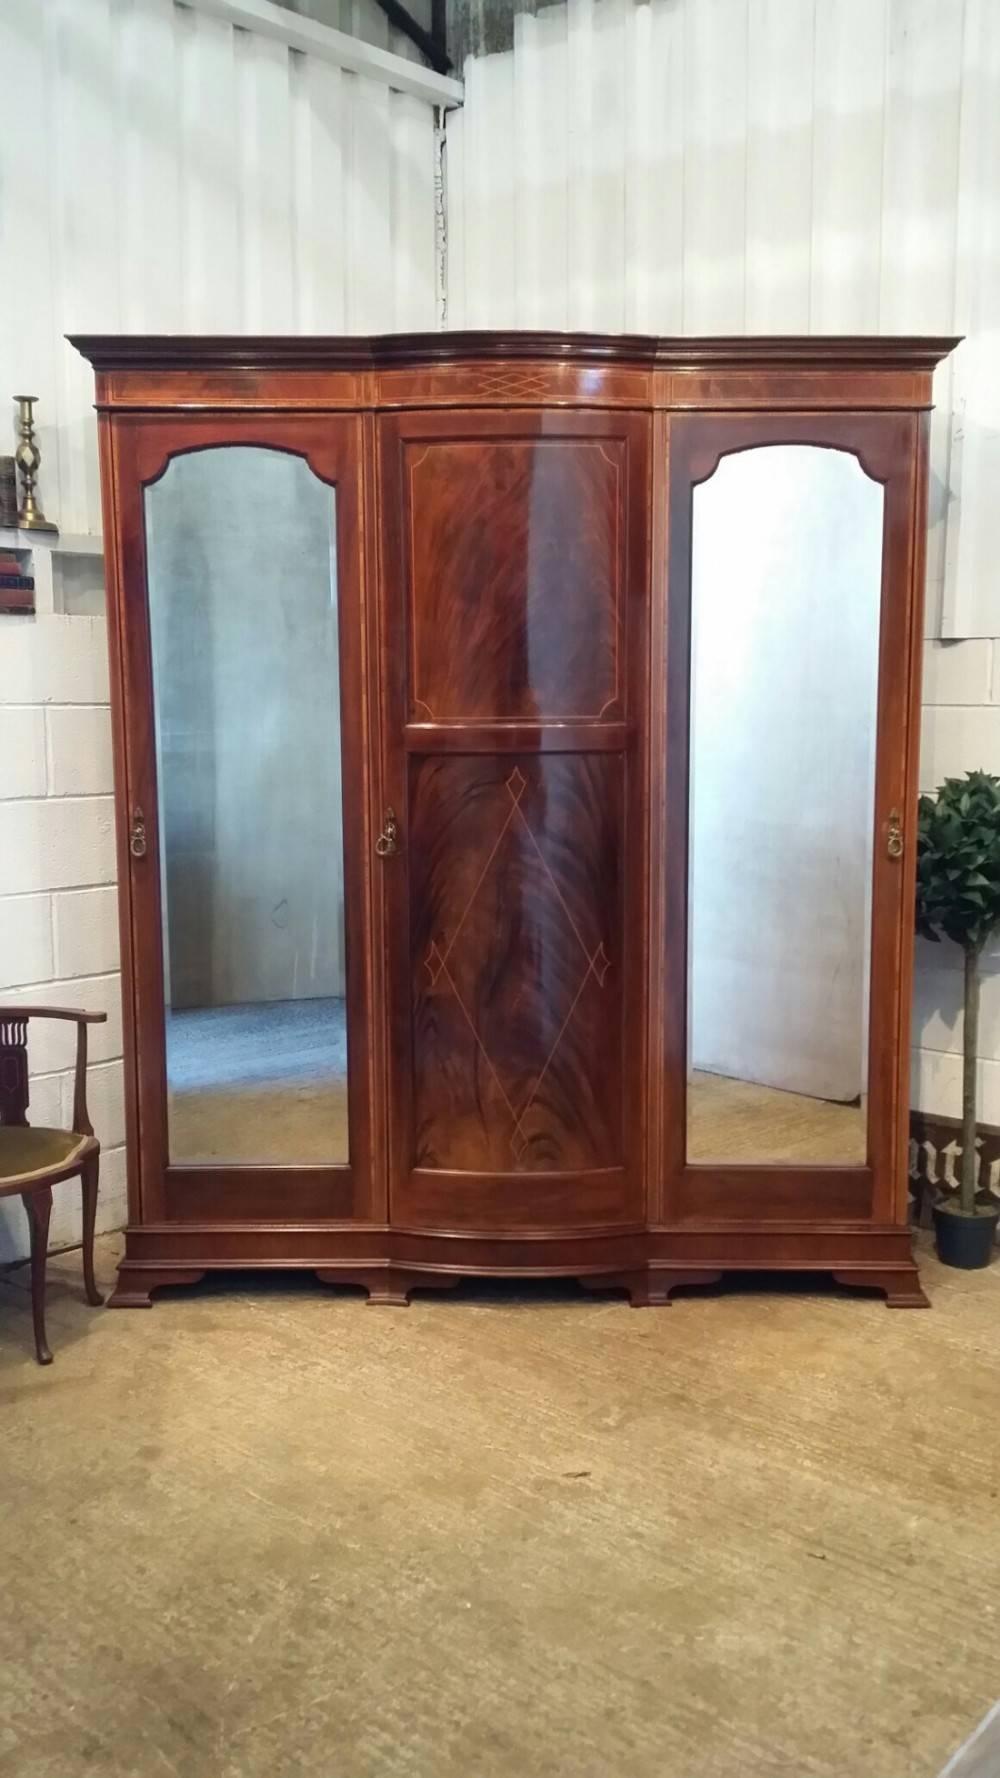 Antique Edwardian Inlaid Mahogany Triple Bow Breakfront Wardrobe for Breakfront Wardrobe (Image 1 of 30)